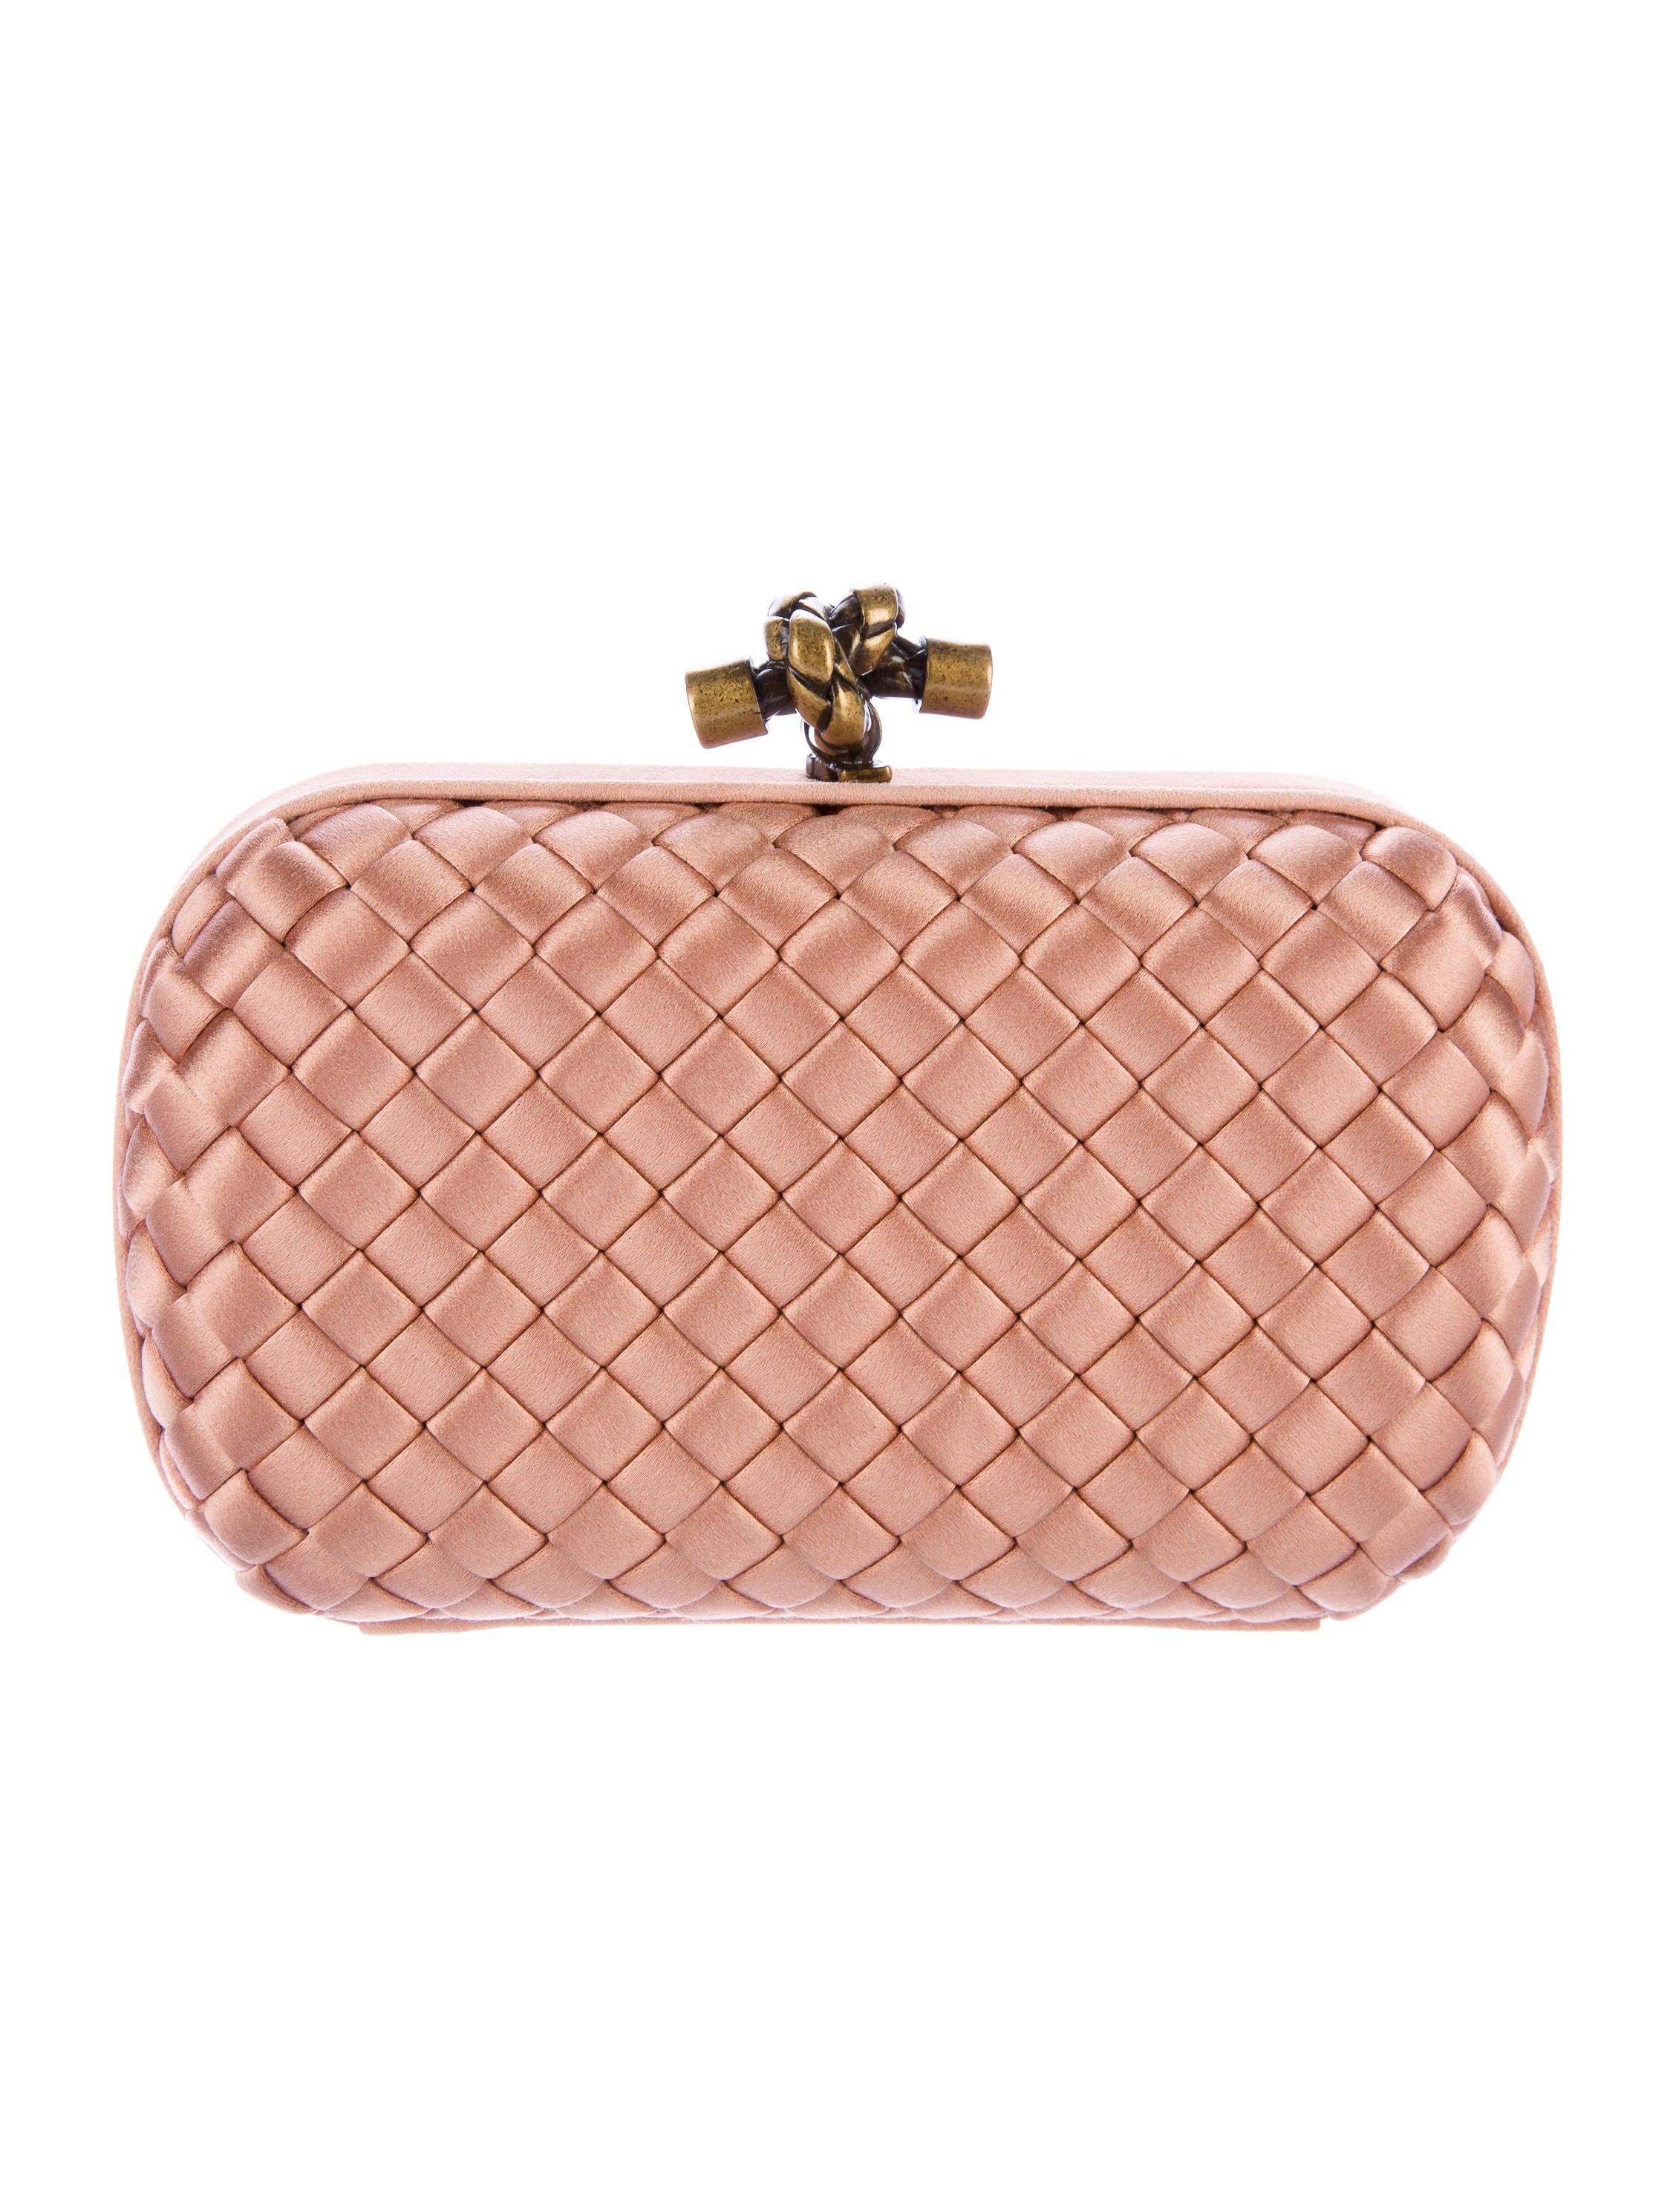 bottega veneta intrecciato knot clutch handbags bot44277 the realreal. Black Bedroom Furniture Sets. Home Design Ideas